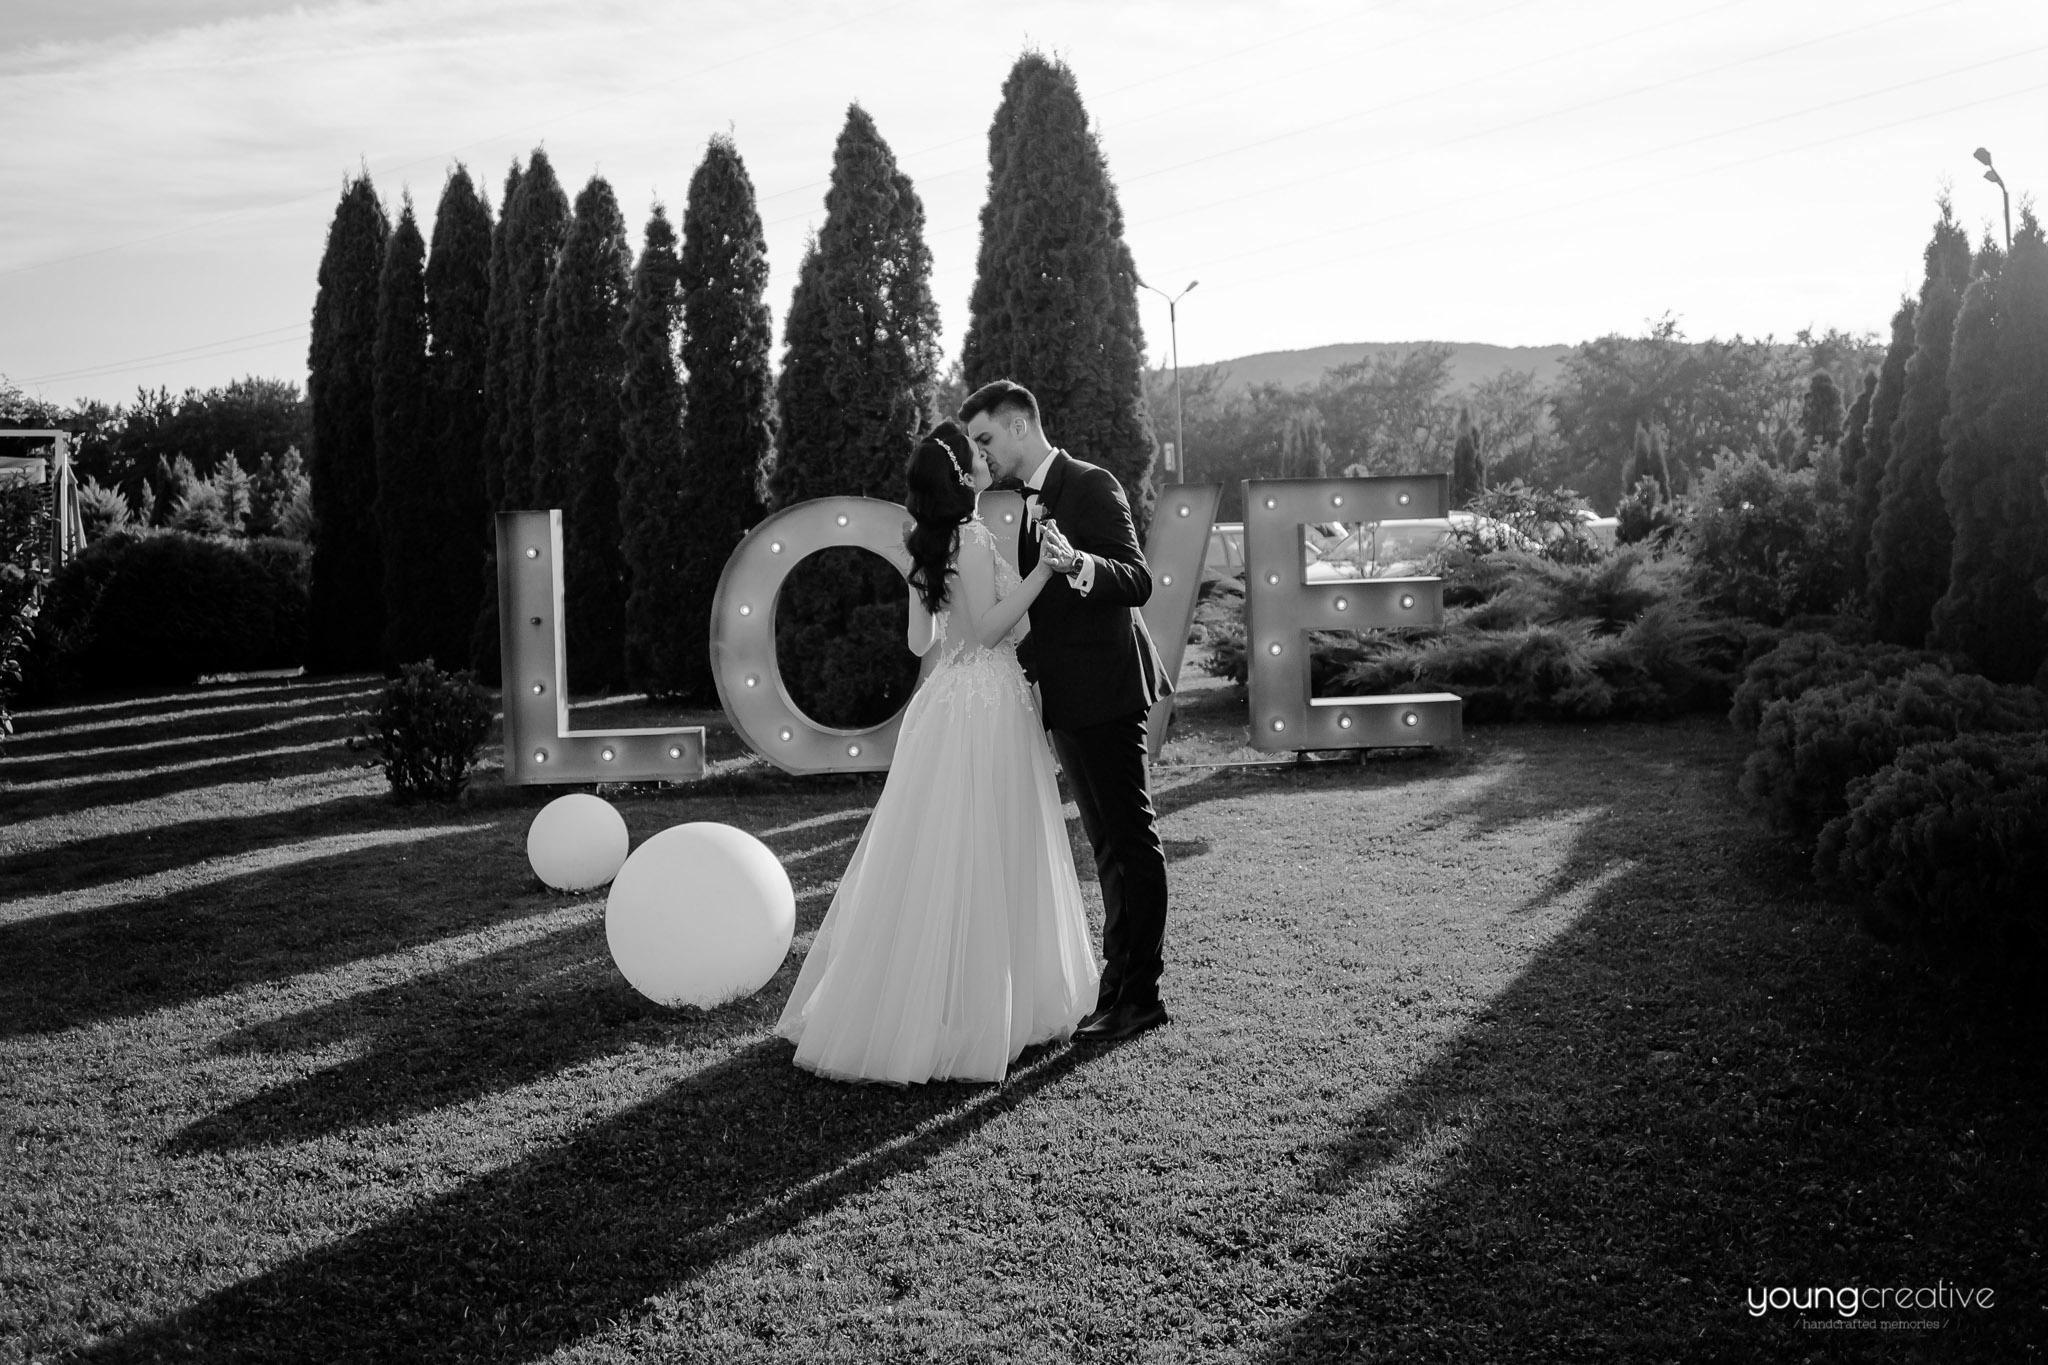 Daiana & Marius | youngcreative.info media © Dan Filipciuc, Cristina Bejan | fotograf nunta Bacau